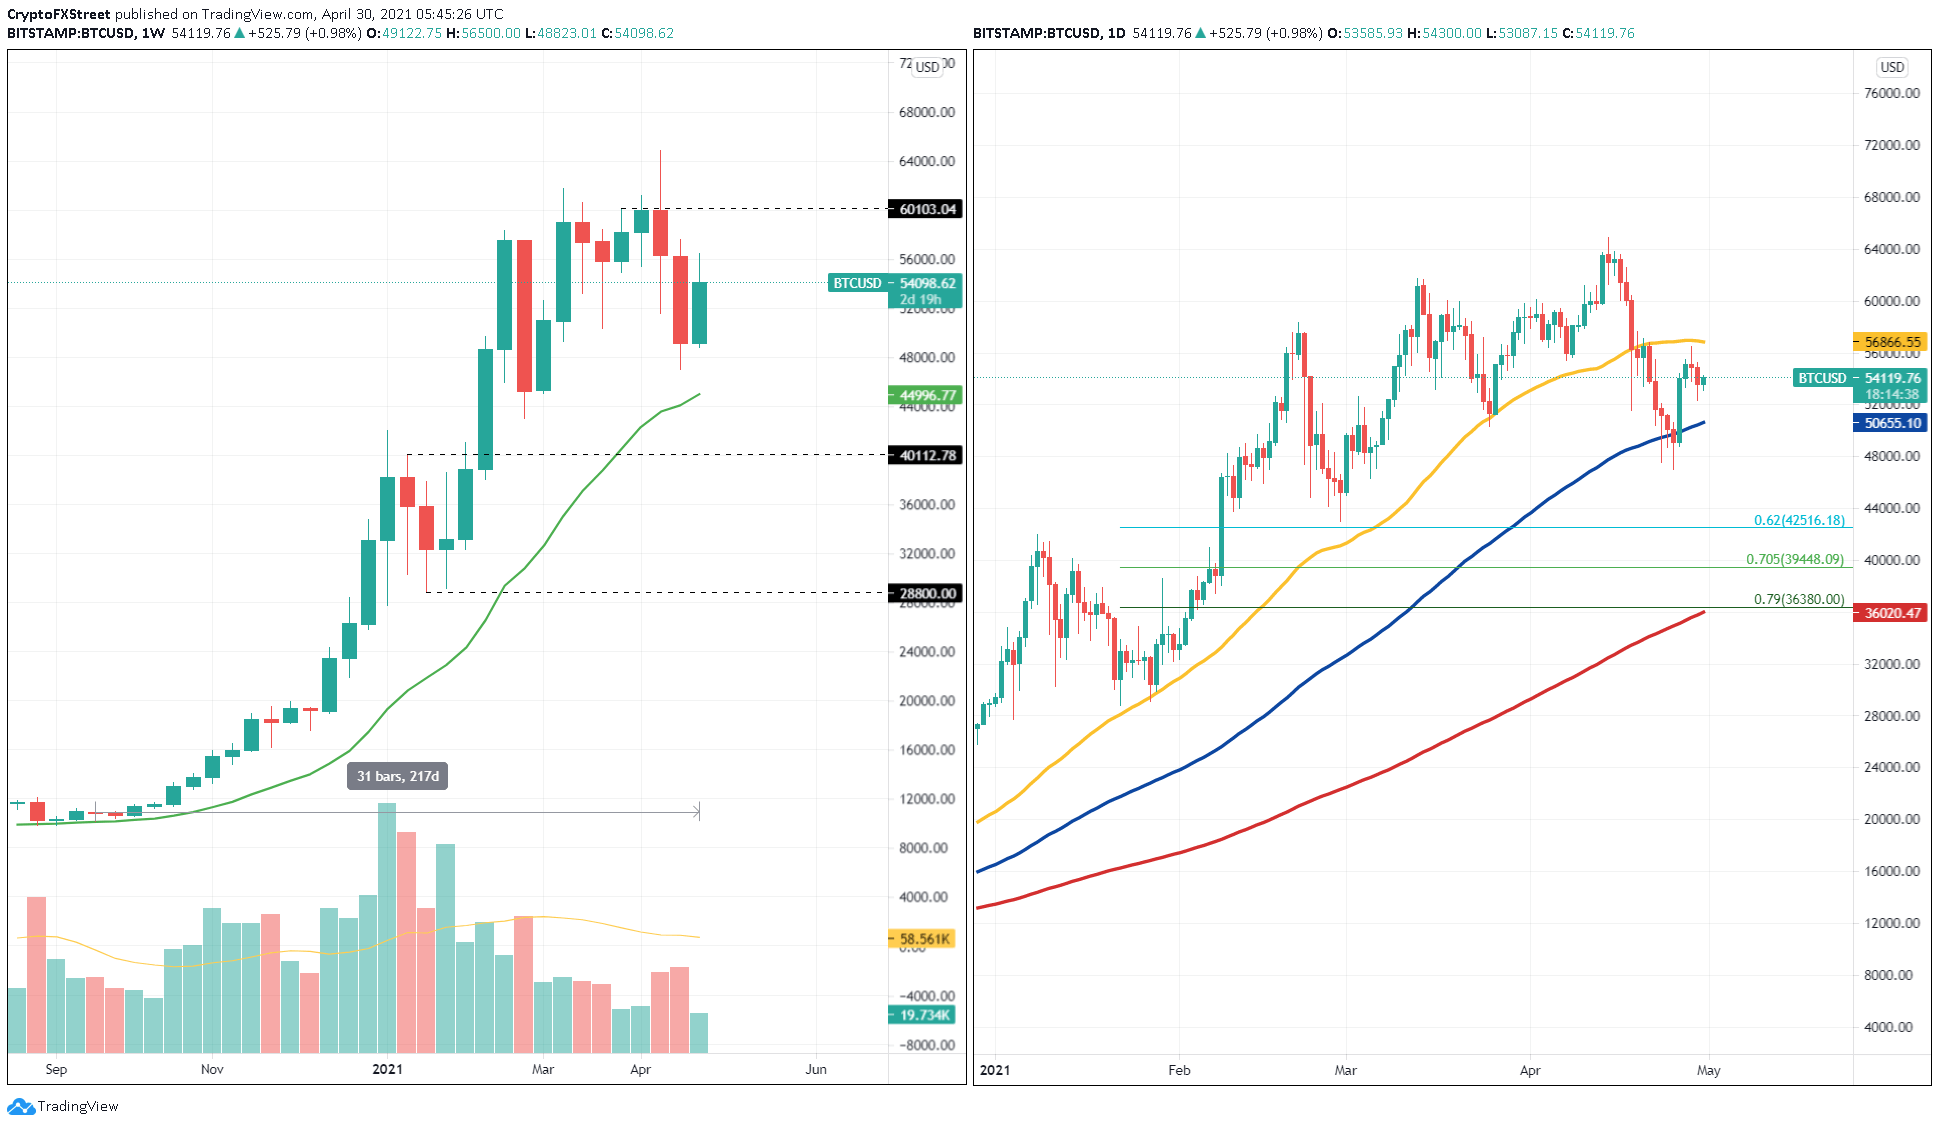 BTC/USD 1-week. 1-day chart